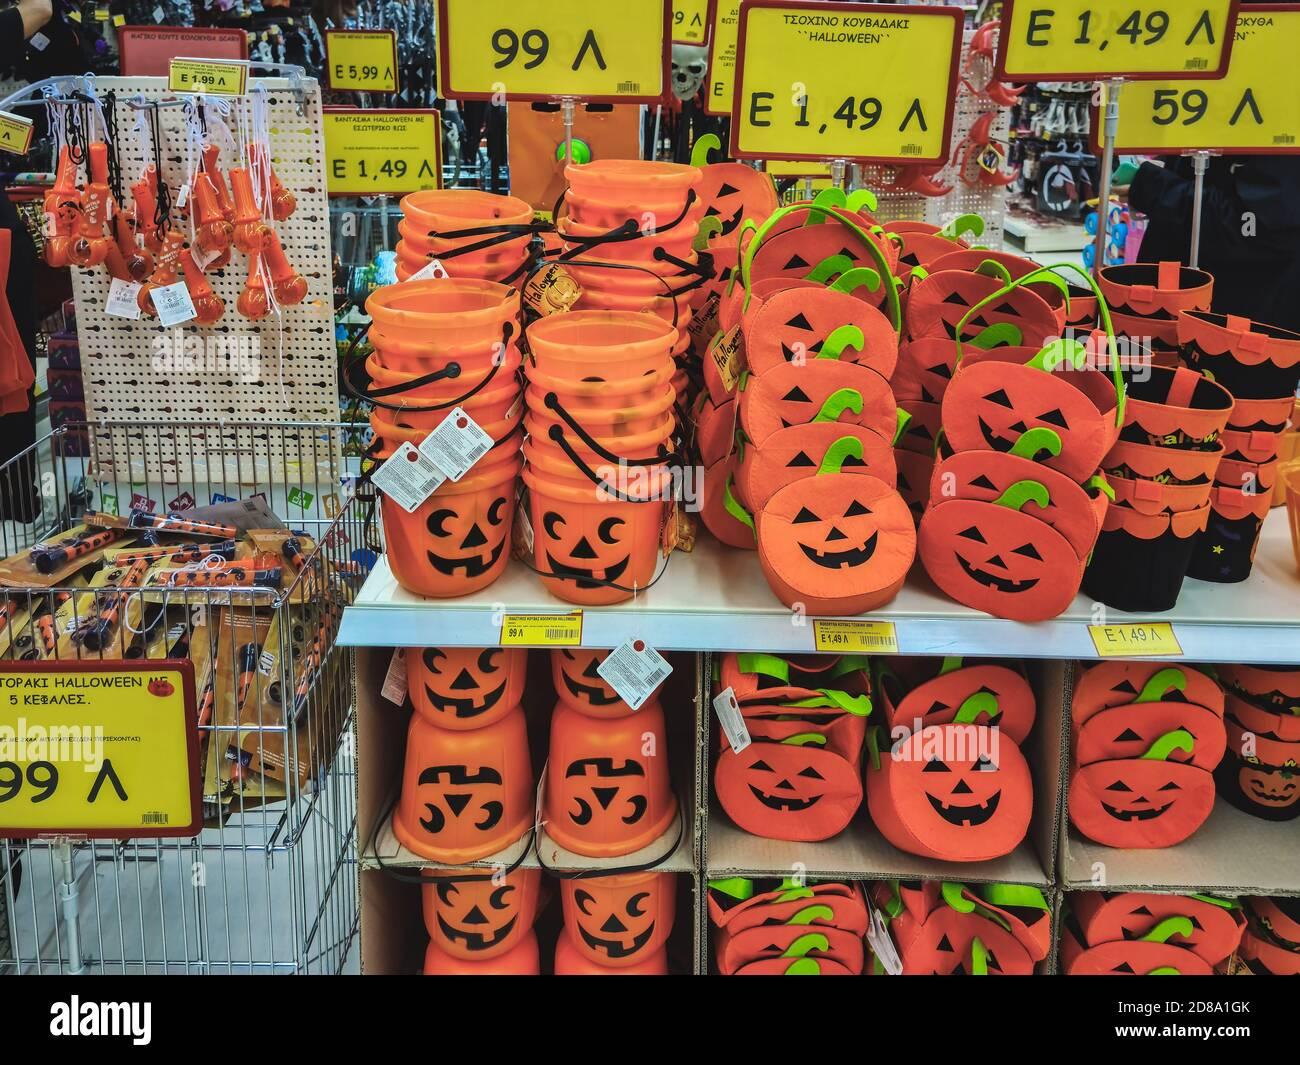 Safeway Halloween Decorations.Halloween Supermarket Products On Shelf Festive Decorations Including Pumpkin Mock Ups On Display For Sale Inside Shop Gallery In Thessaloniki Greece Stock Photo Alamy